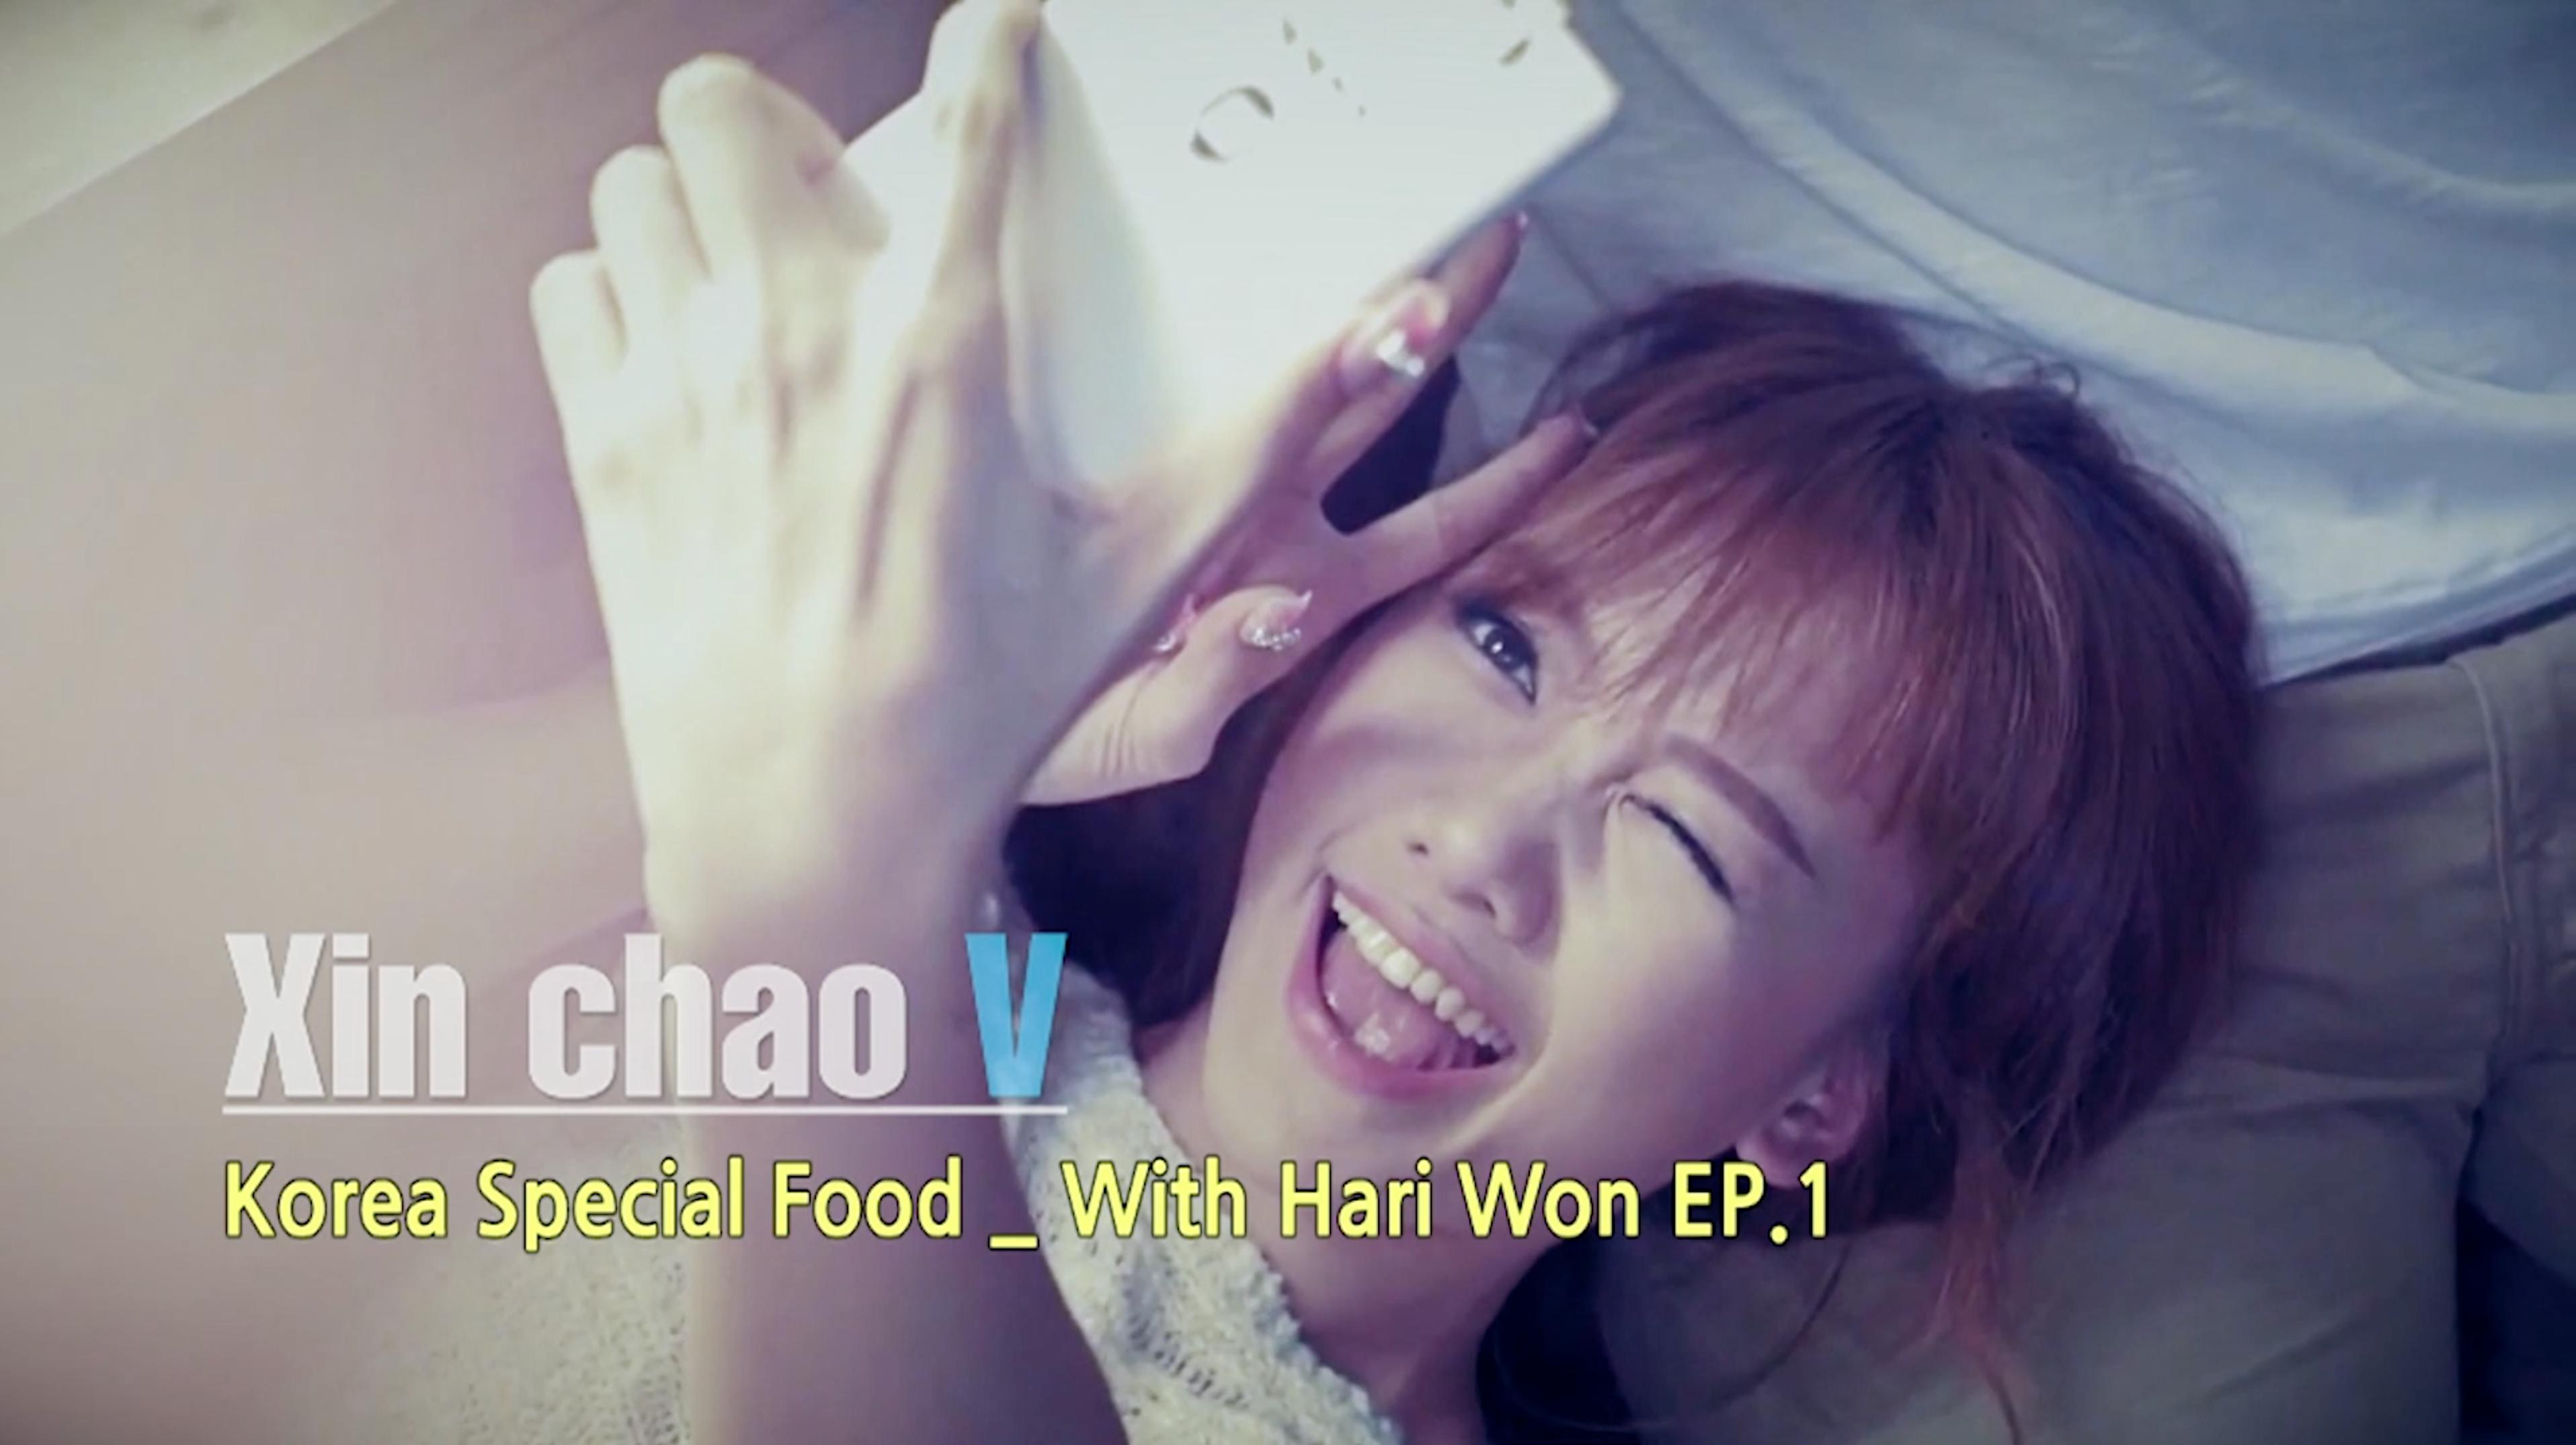 Korea Special Food_With Hari Won EP.1